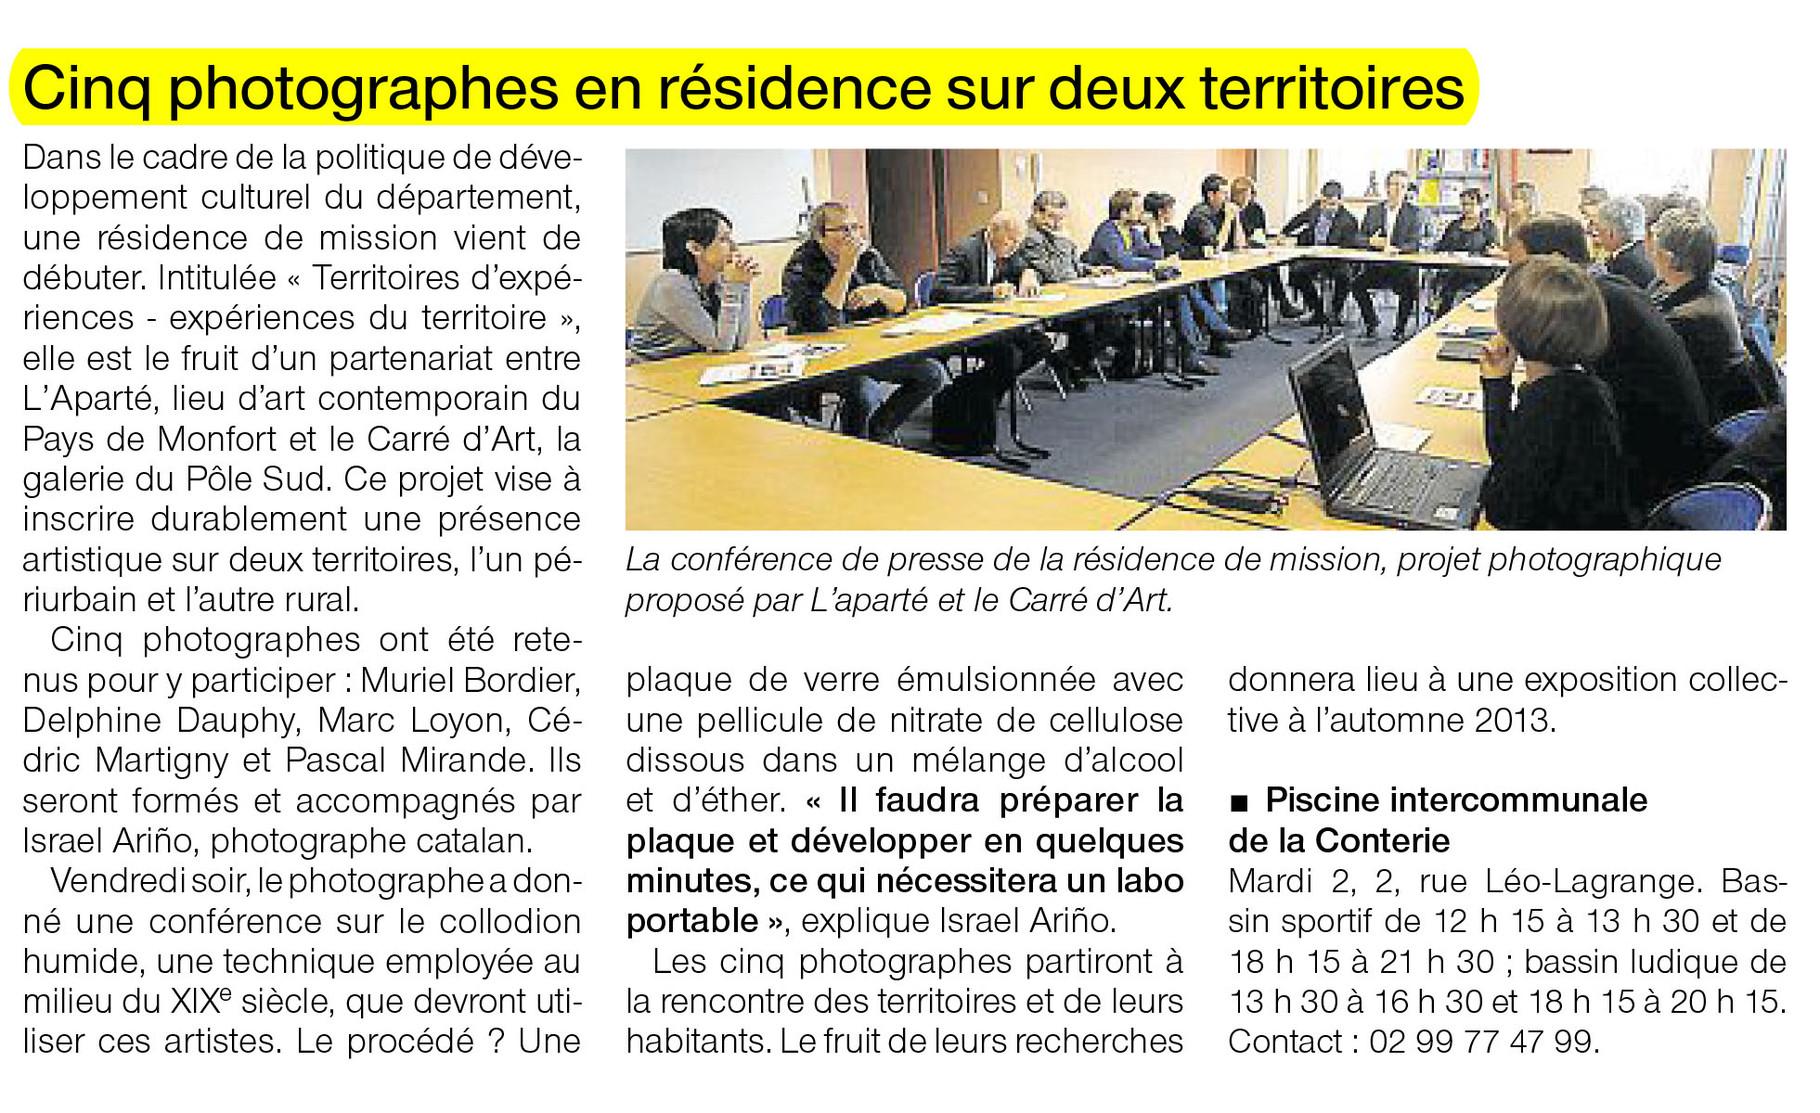 Ouest-France - 2 octobre 2012